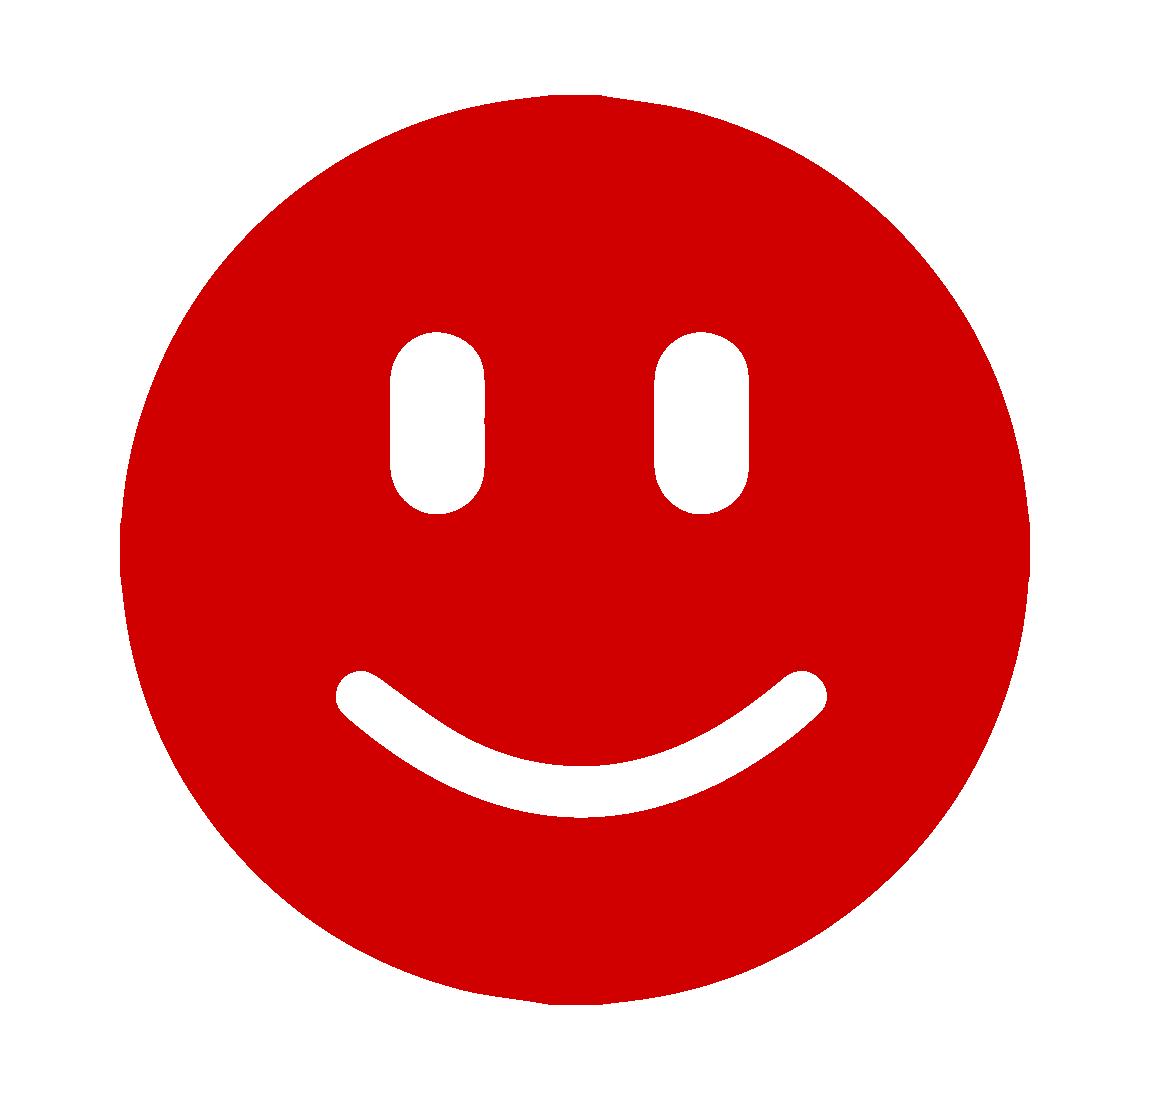 happy-icon-13